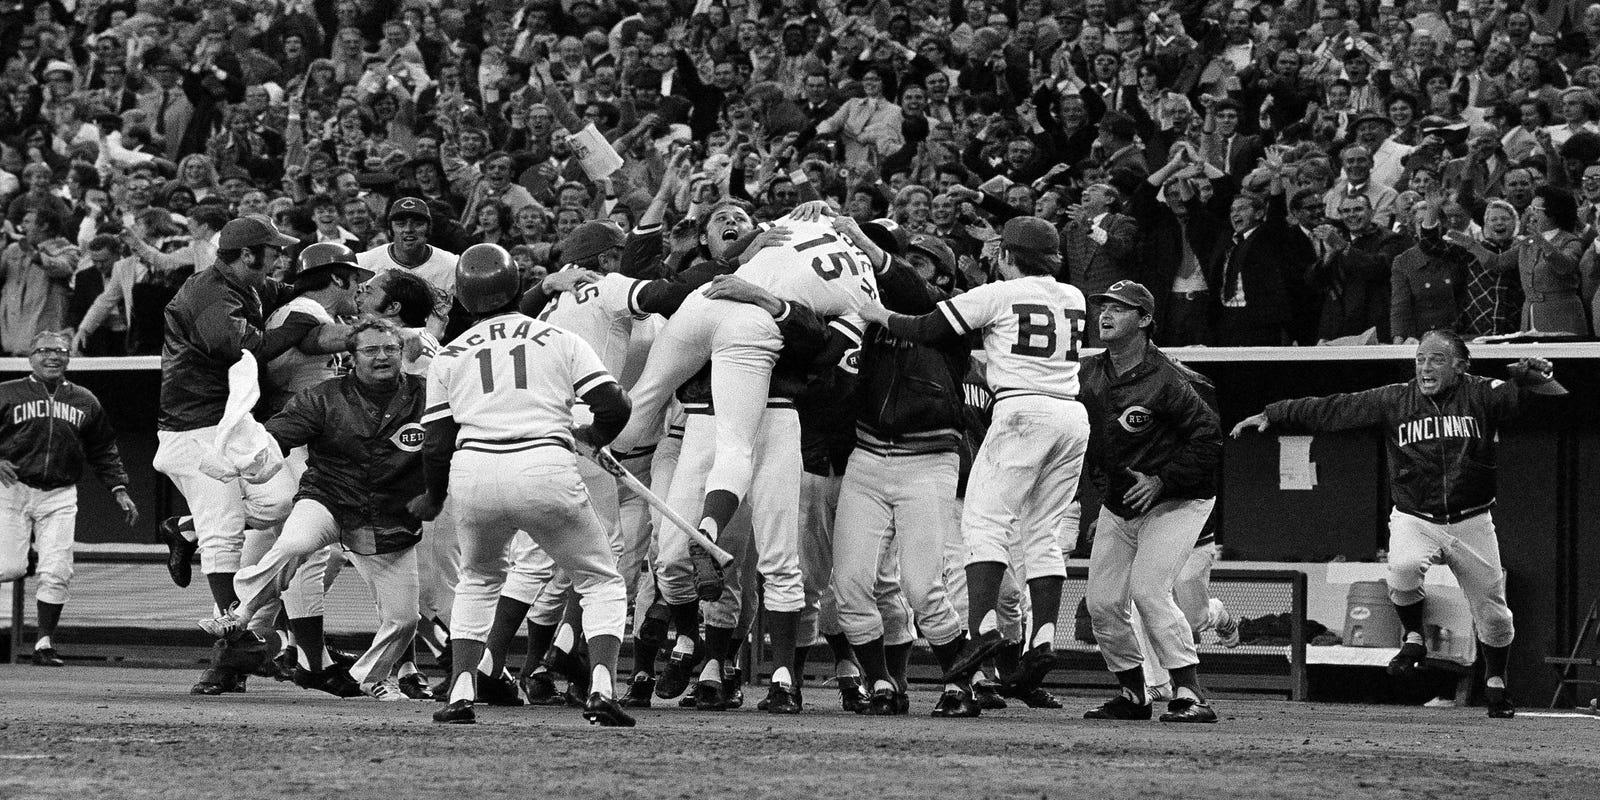 Cincinnati Reds 150th anniversary: 2nd best game, winning the 1972 NL  pennant